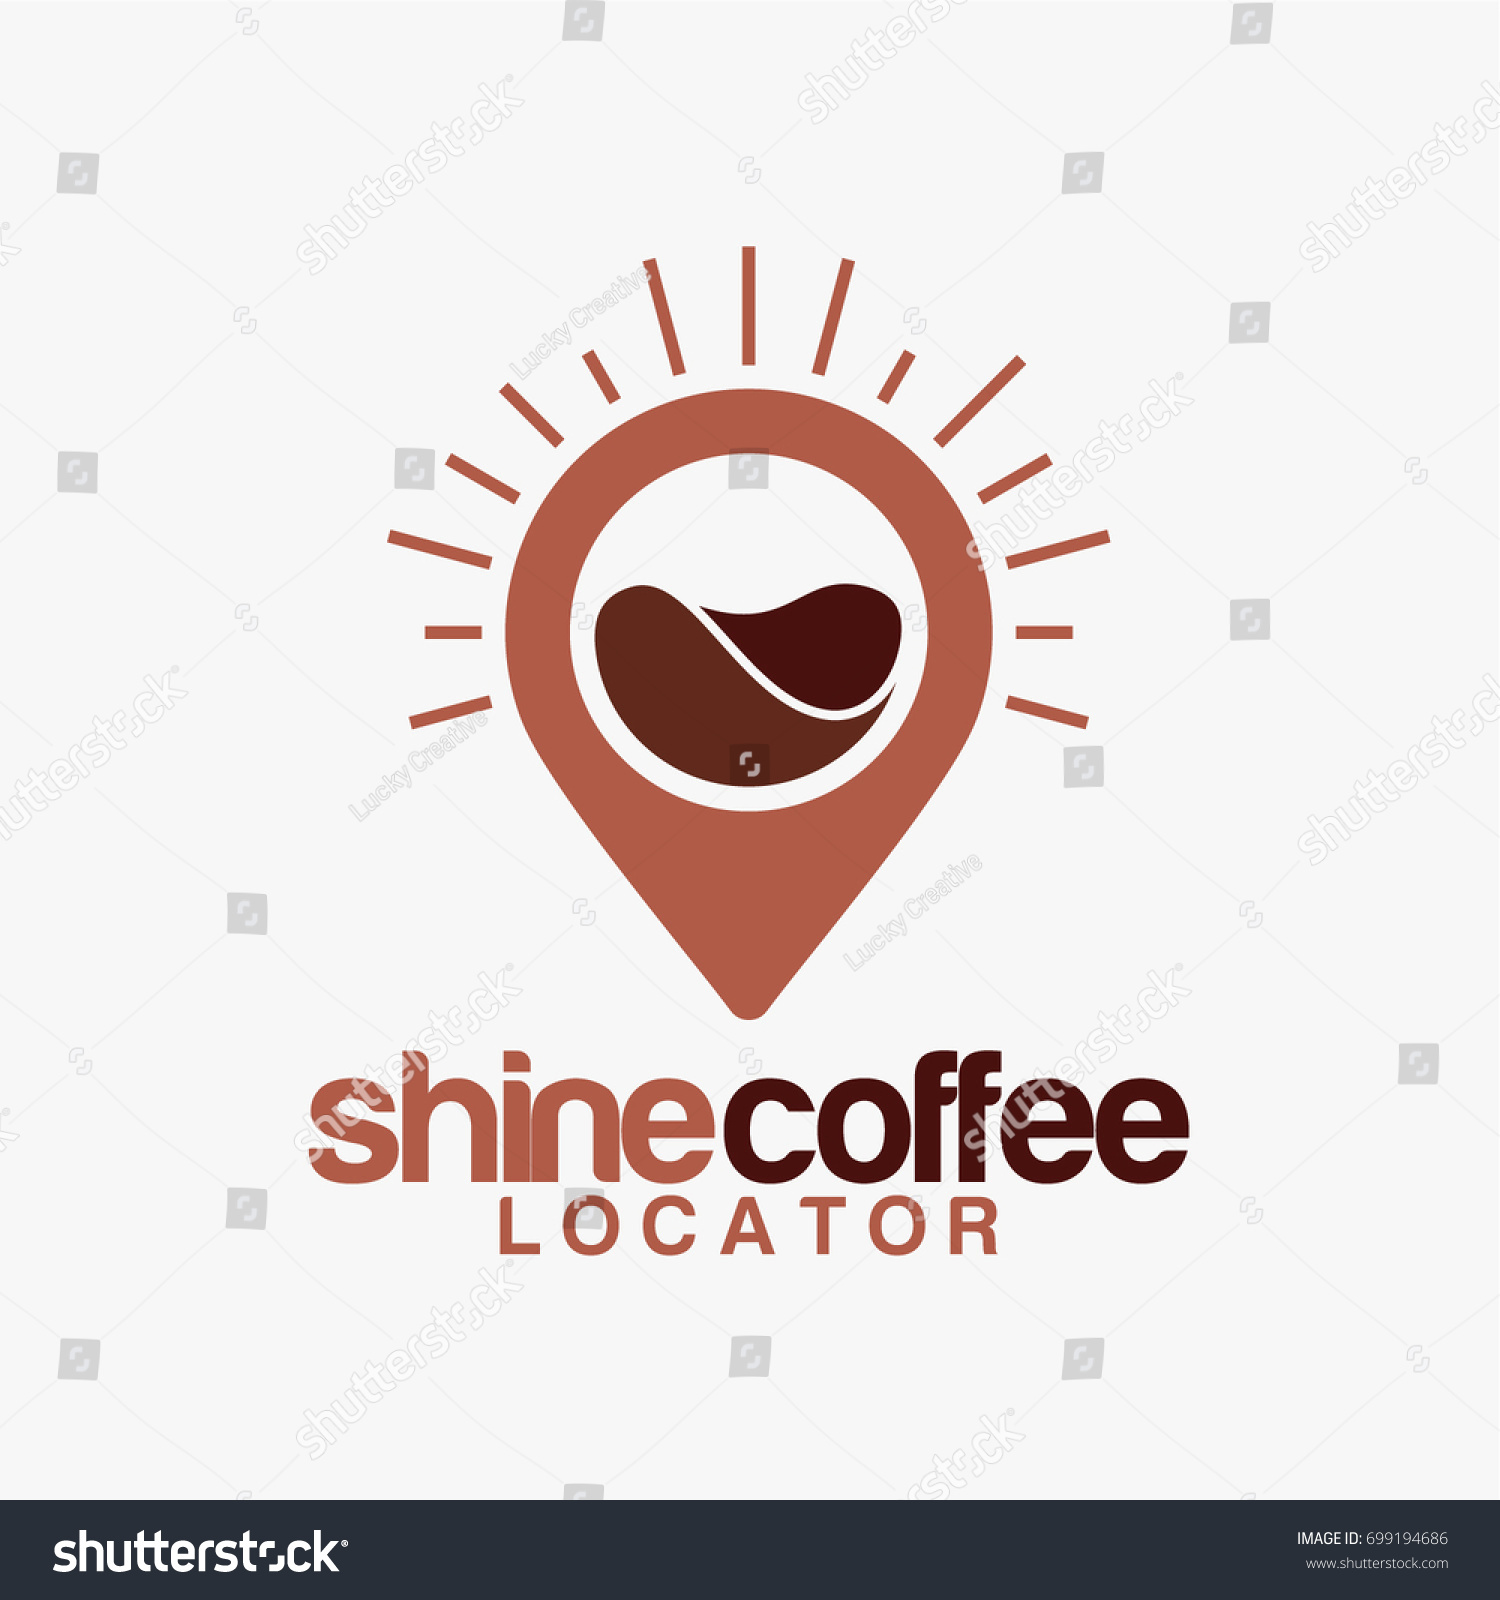 Coffee Point Logo Designs Shine Coffee Stock Vector (2018) 699194686 ...